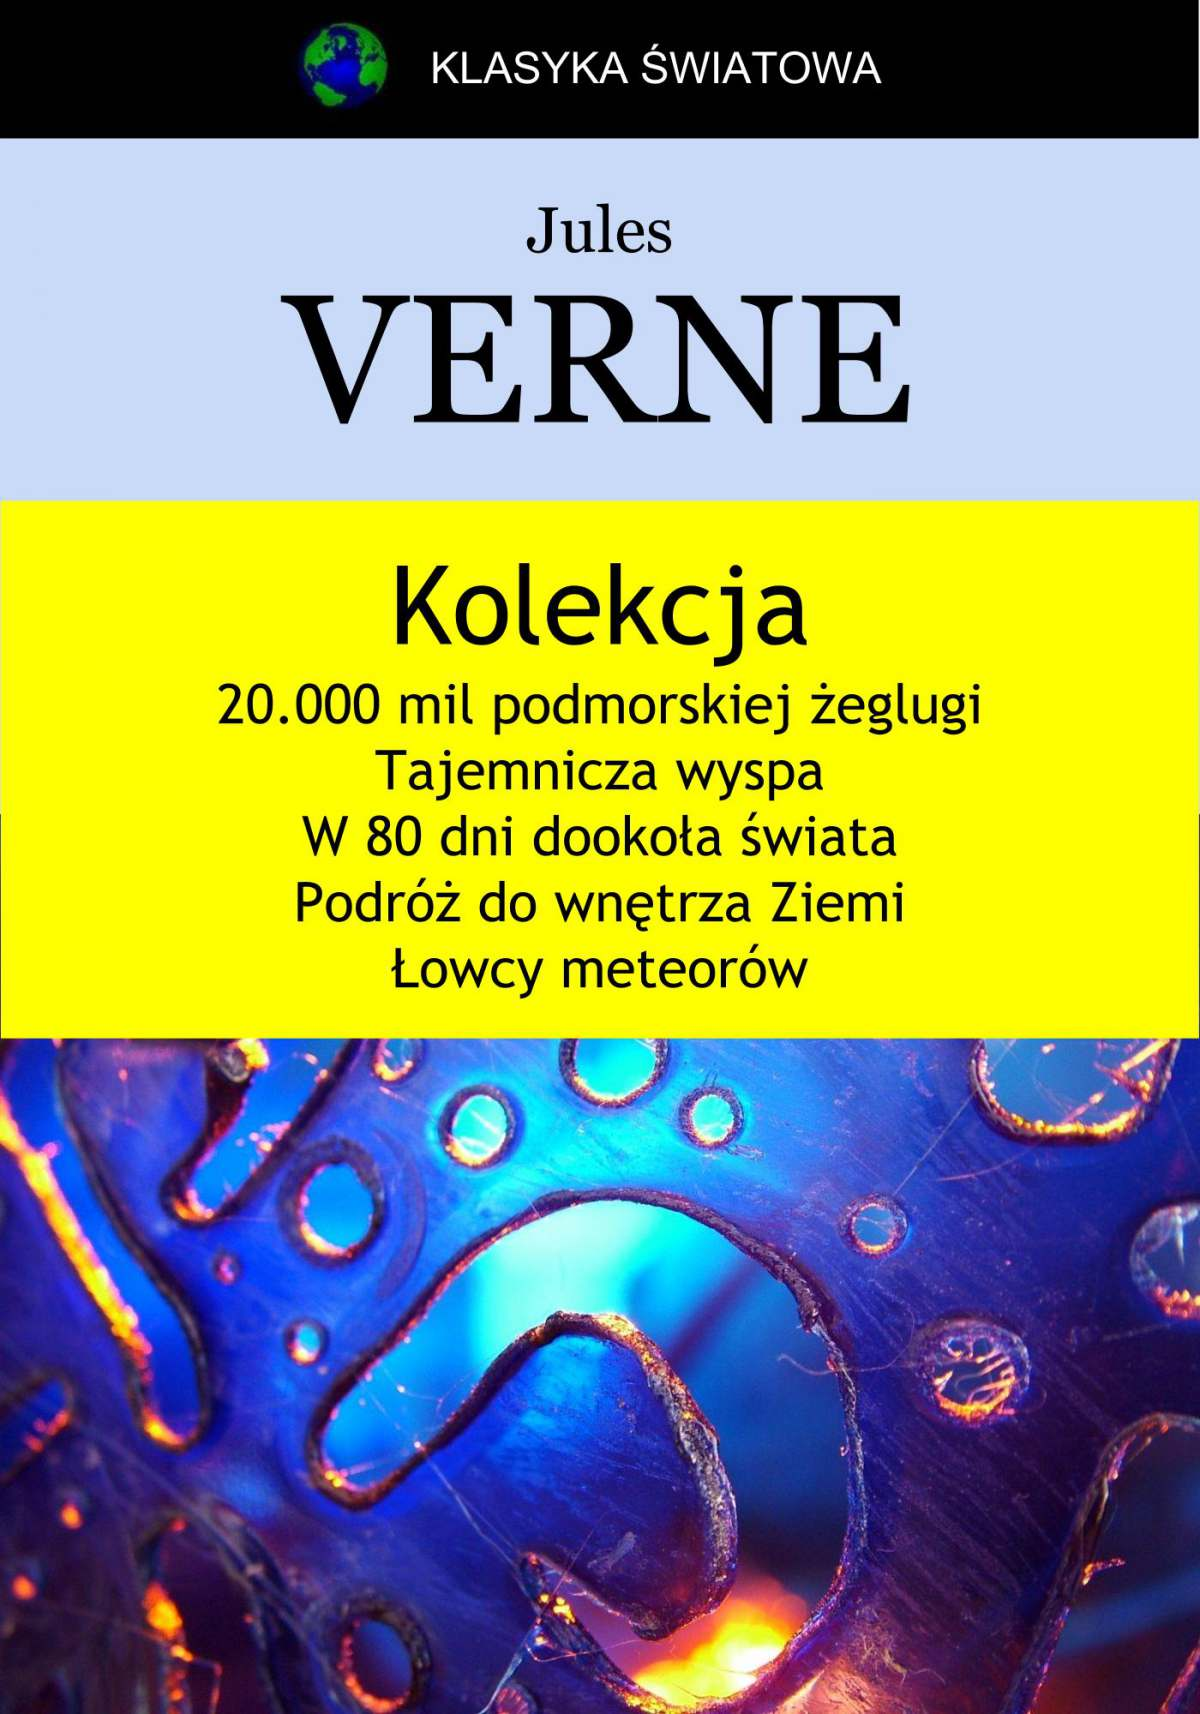 Kolekcja Verne'a - Ebook (Książka EPUB) do pobrania w formacie EPUB